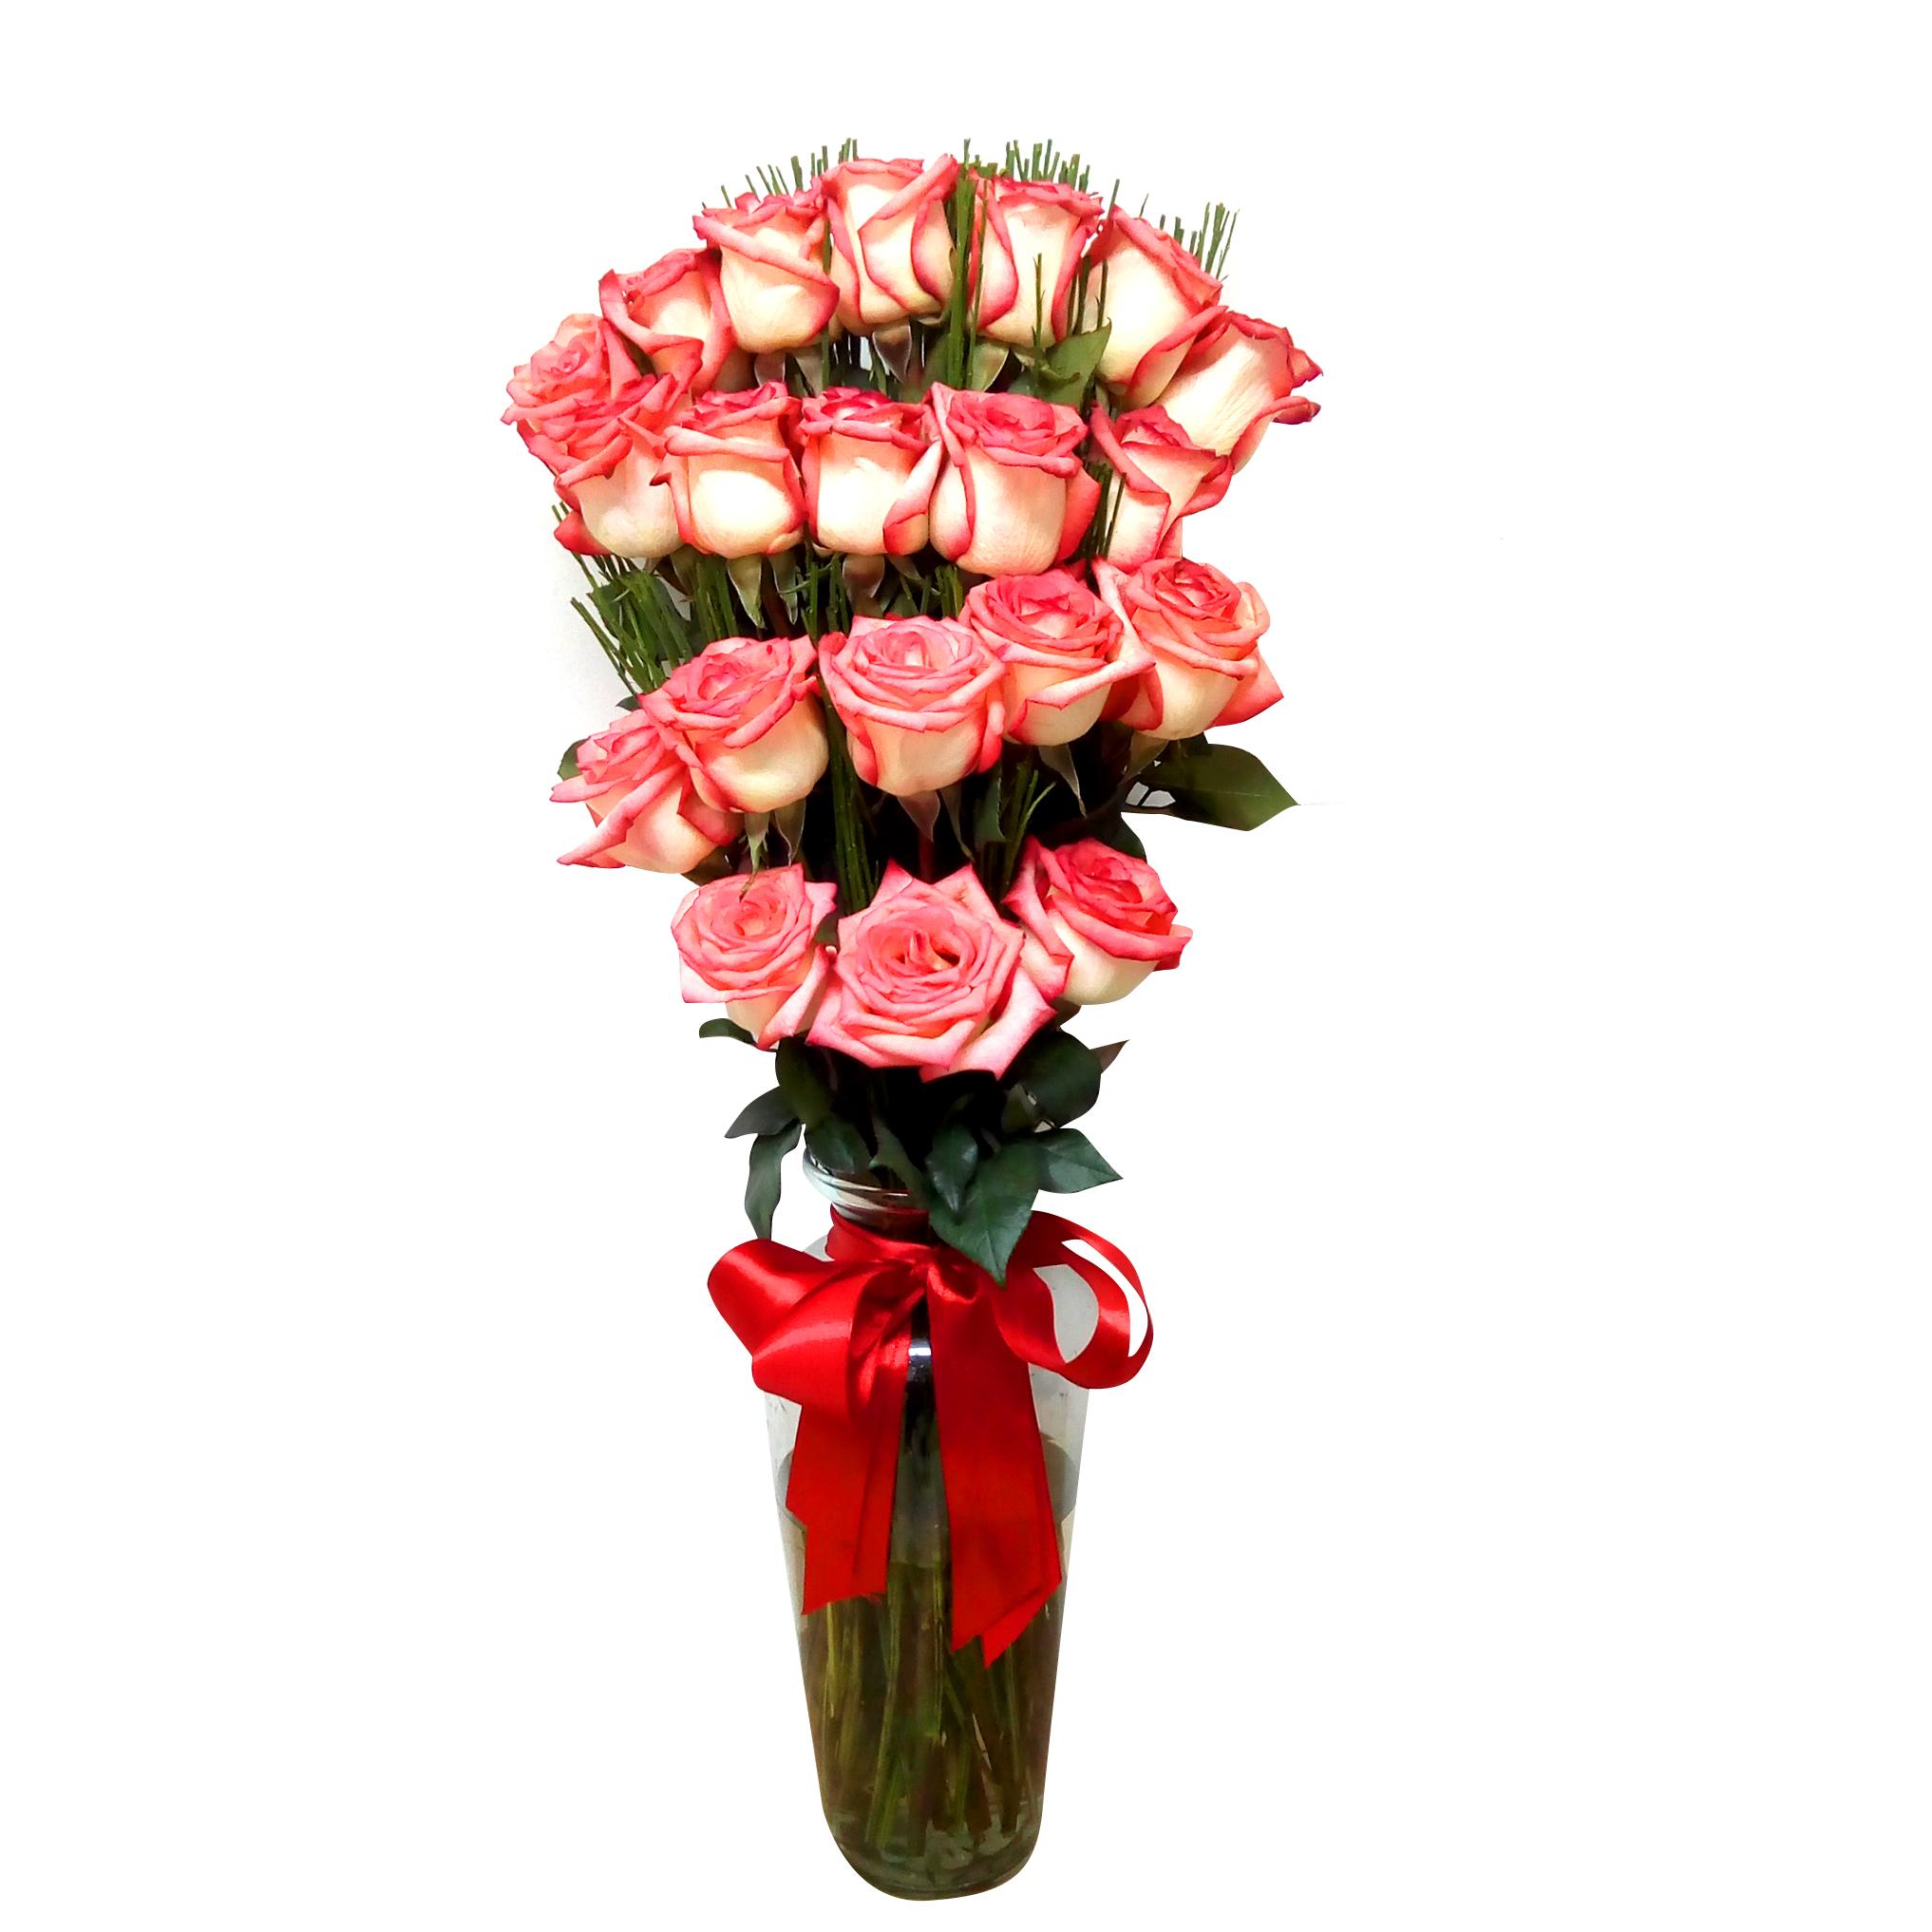 Floreros de Rosas Rosadas en Escala